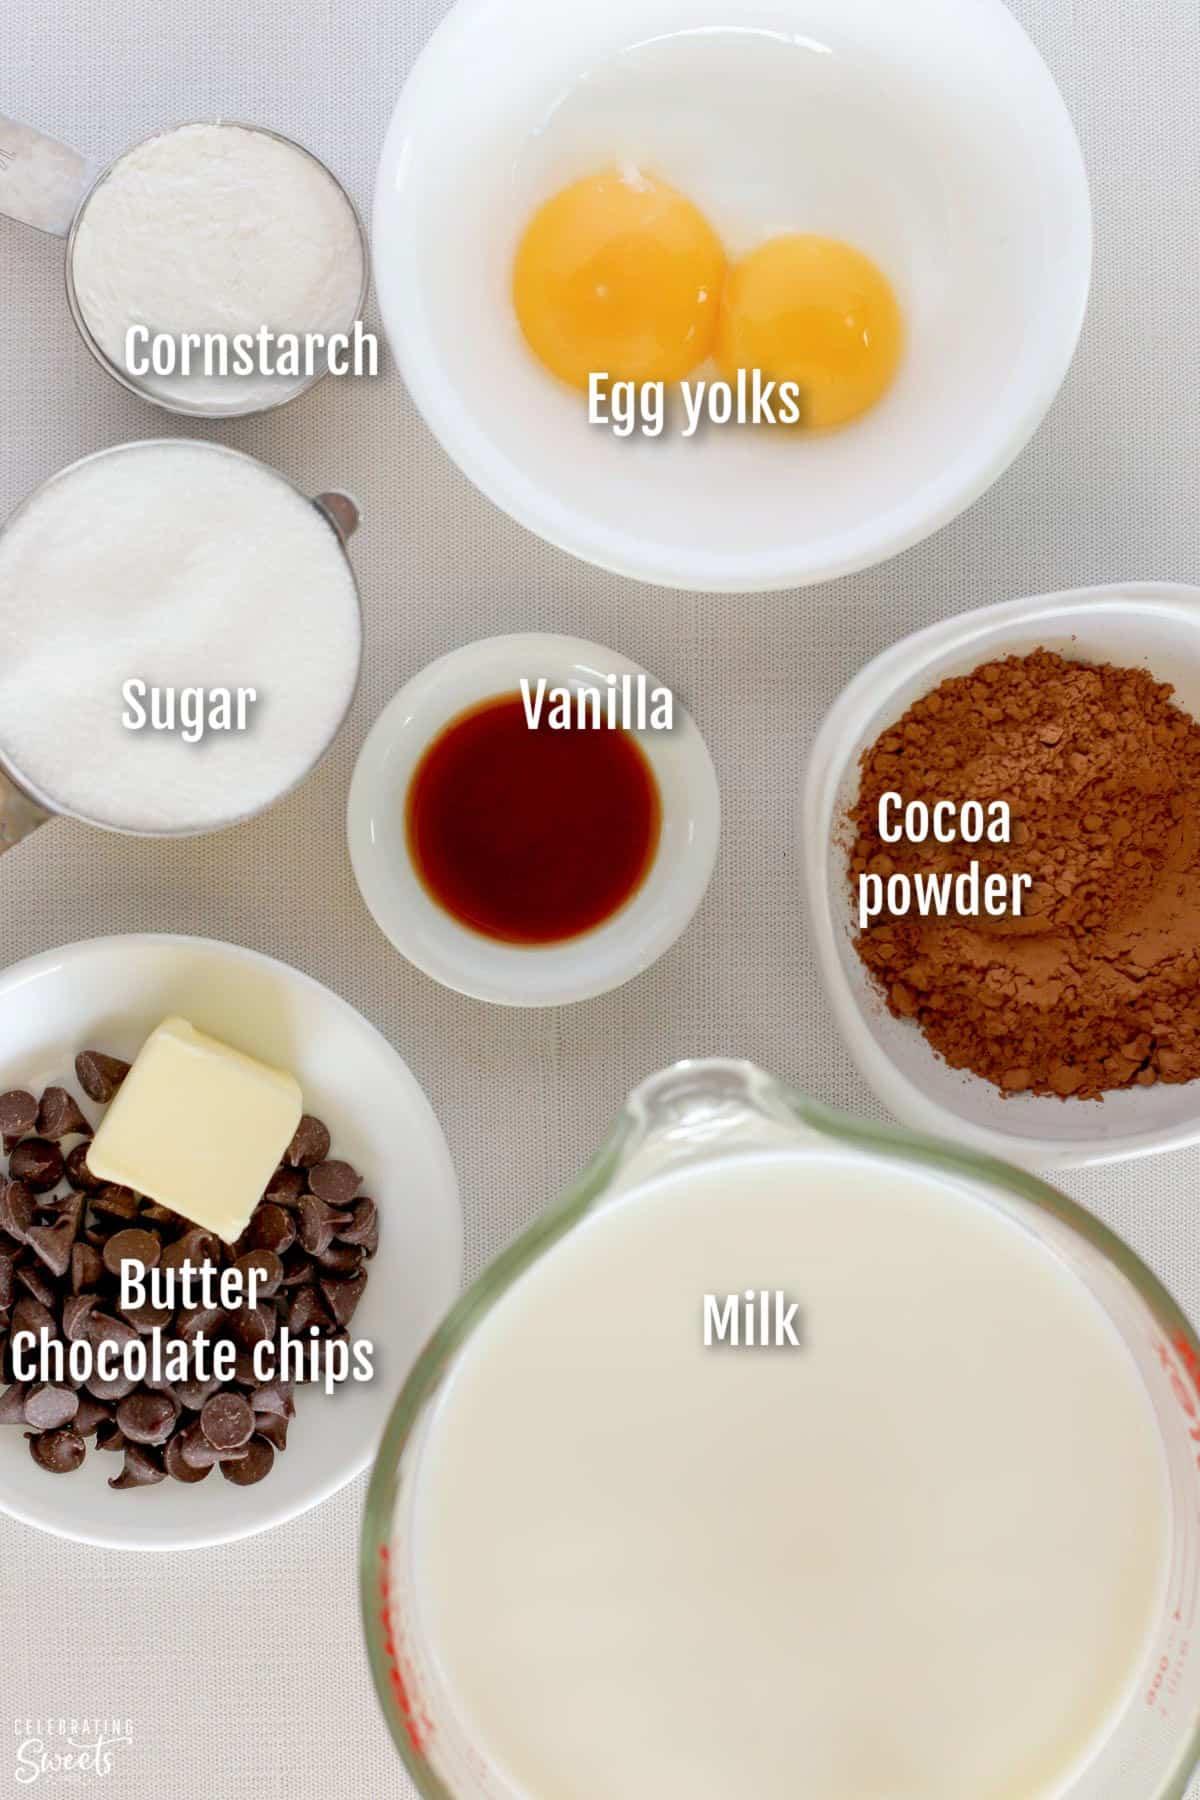 Ingredients for making chocolate pudding (milk, sugar, chocolate, butter, vanilla, cornstarch, egg yolks)